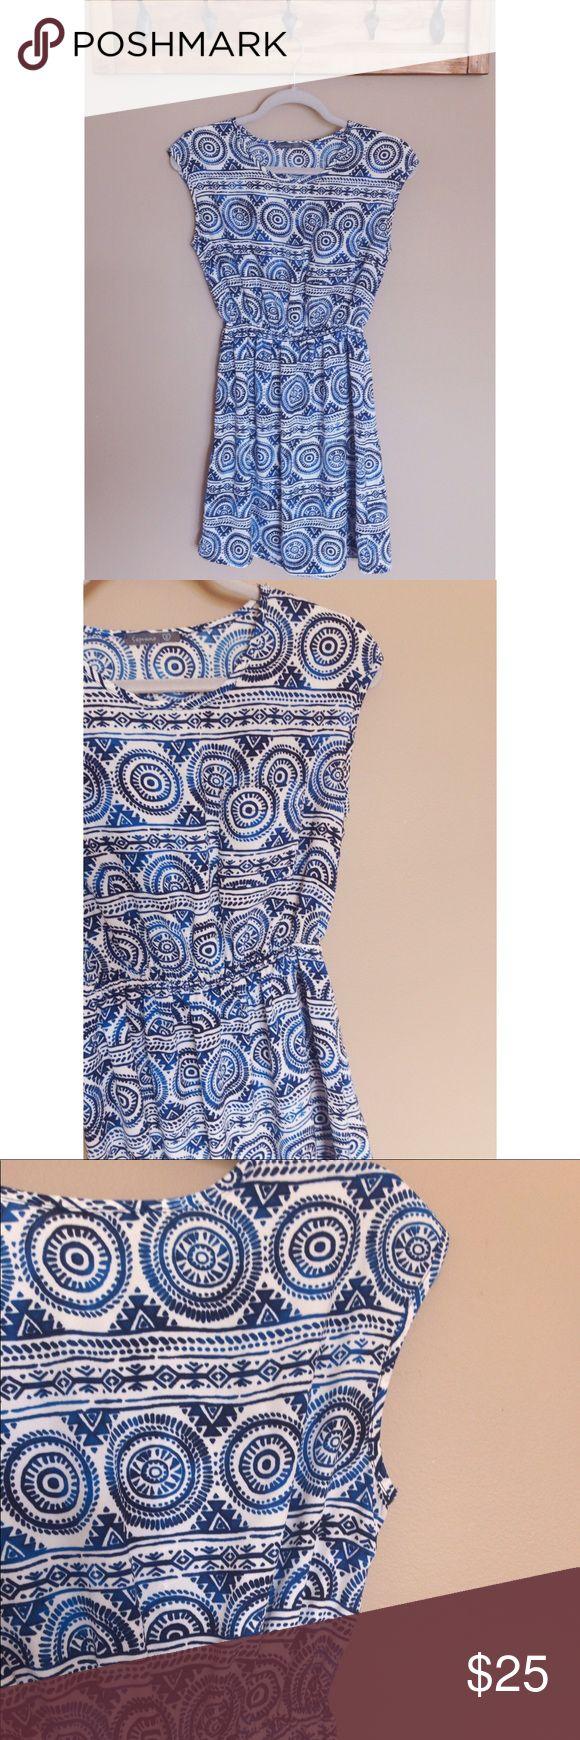 Printed Dress Light weight dress featuring a semi cap sleeve, flattering elastic band waist and a unique Aztec print. Perfect summer work dress! Soprano Dresses